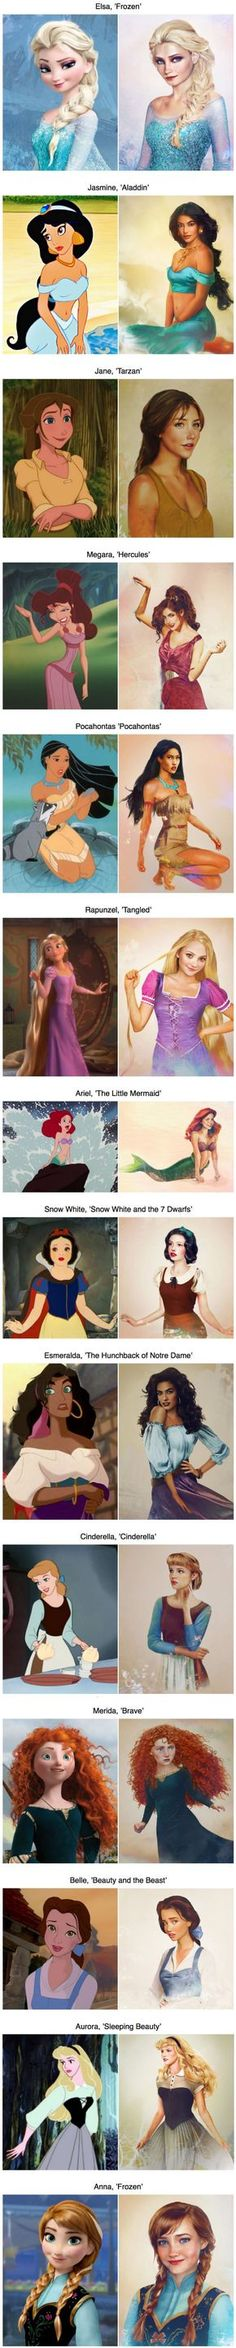 Best Disney Tattoo - What the real Disney princesses looked like (By Jirka Vät&amp. Real Disney Princesses, Disney Princess Facts, Disney Princess Drawings, Disney Princess Pictures, Disney Facts, Disney Drawings, Disney Pictures, Funny Pictures, Funny Cartoon Memes